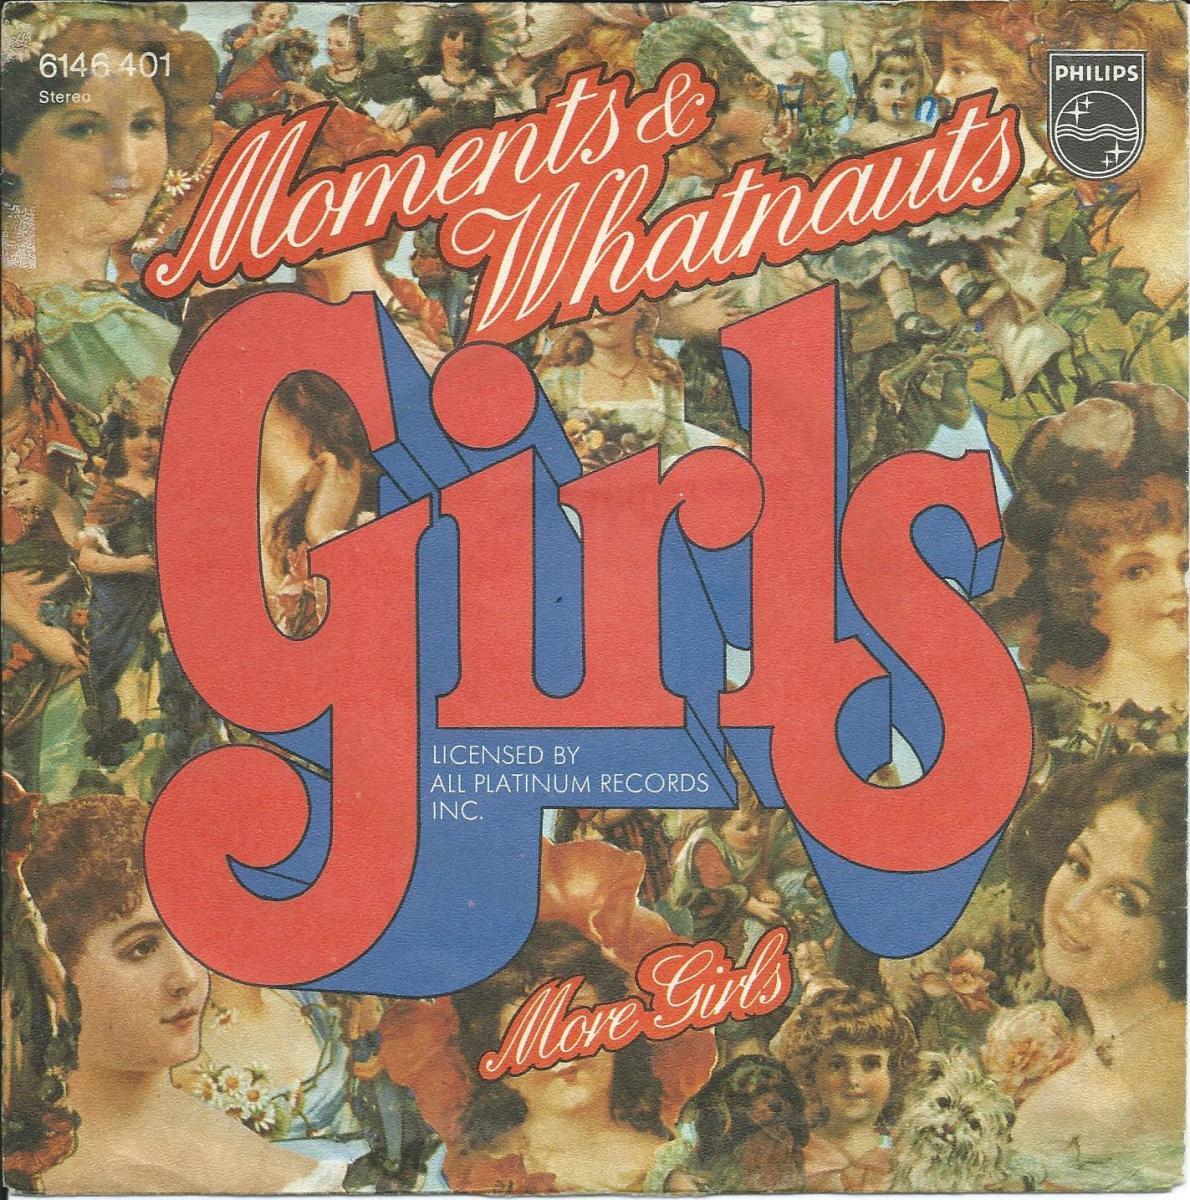 MOMENTS & WHATNAUTS / GIRLS - (GERMANY PRESS) (7